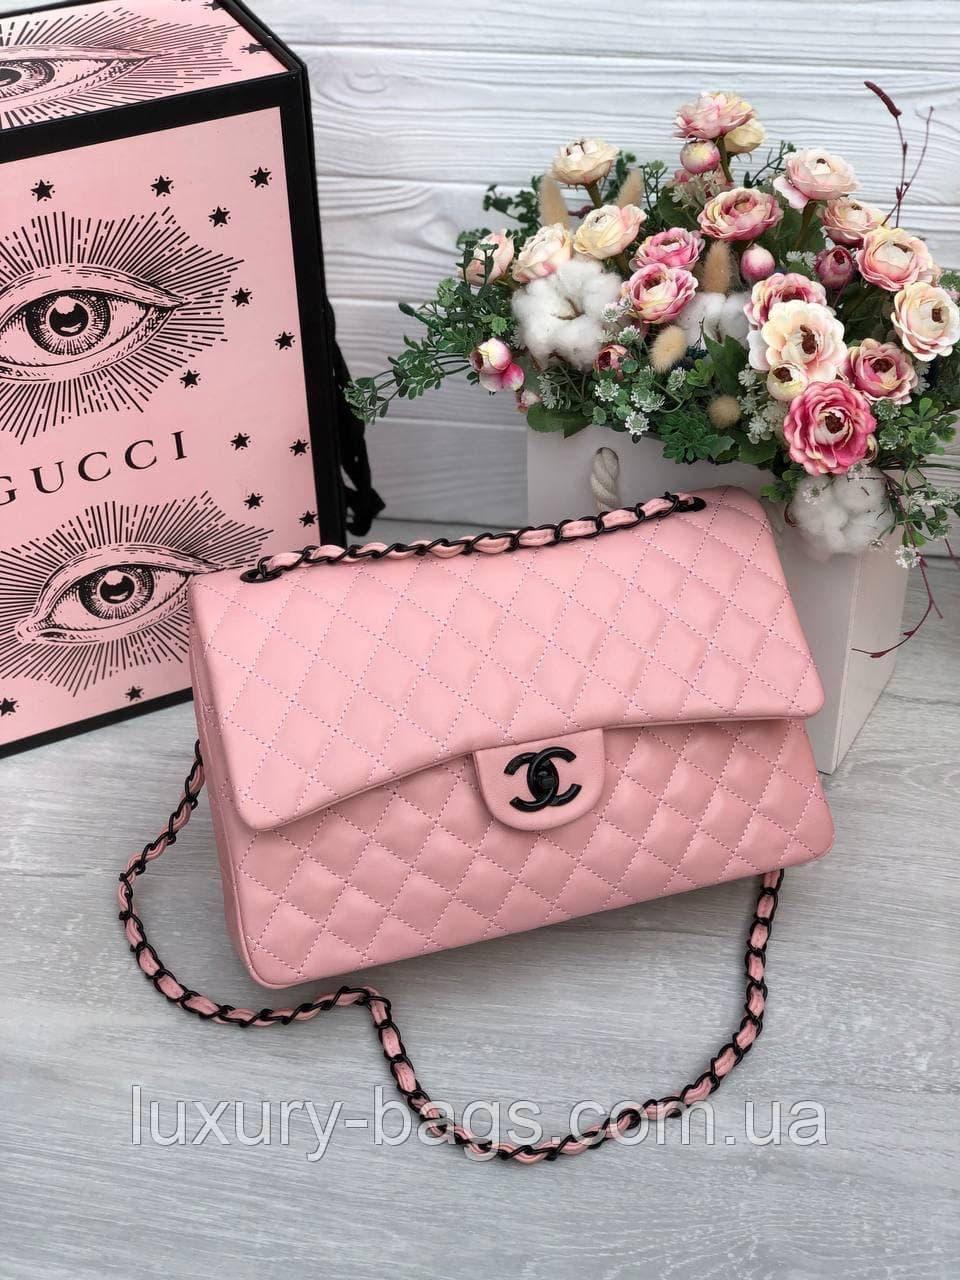 Шикарна жіноча сумка знижка